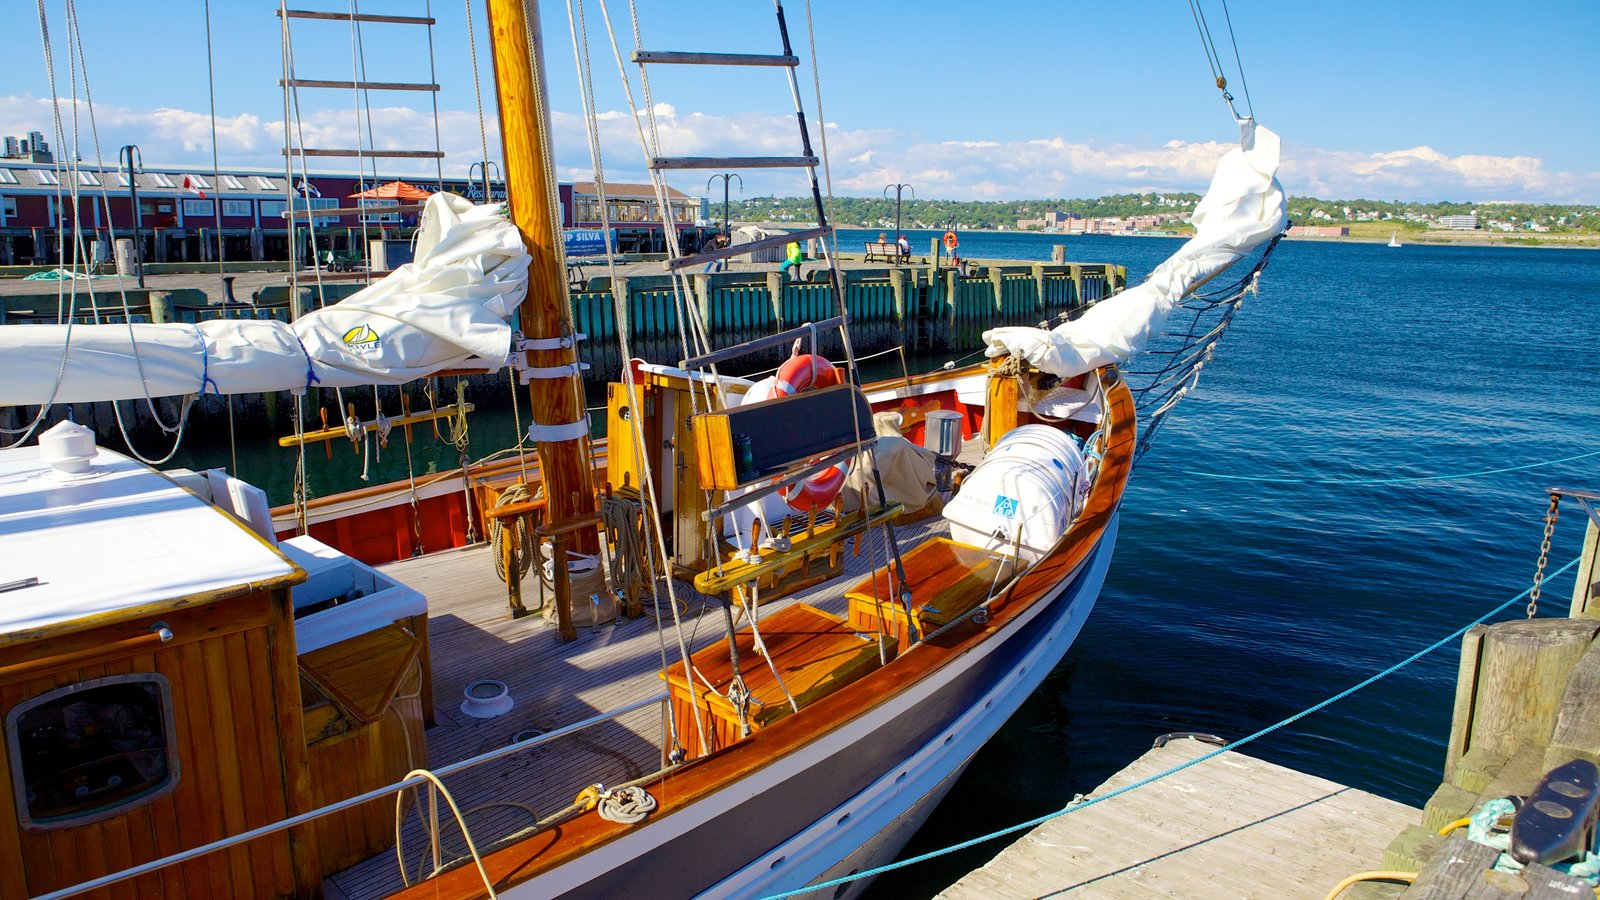 Halifax mostrando una marina